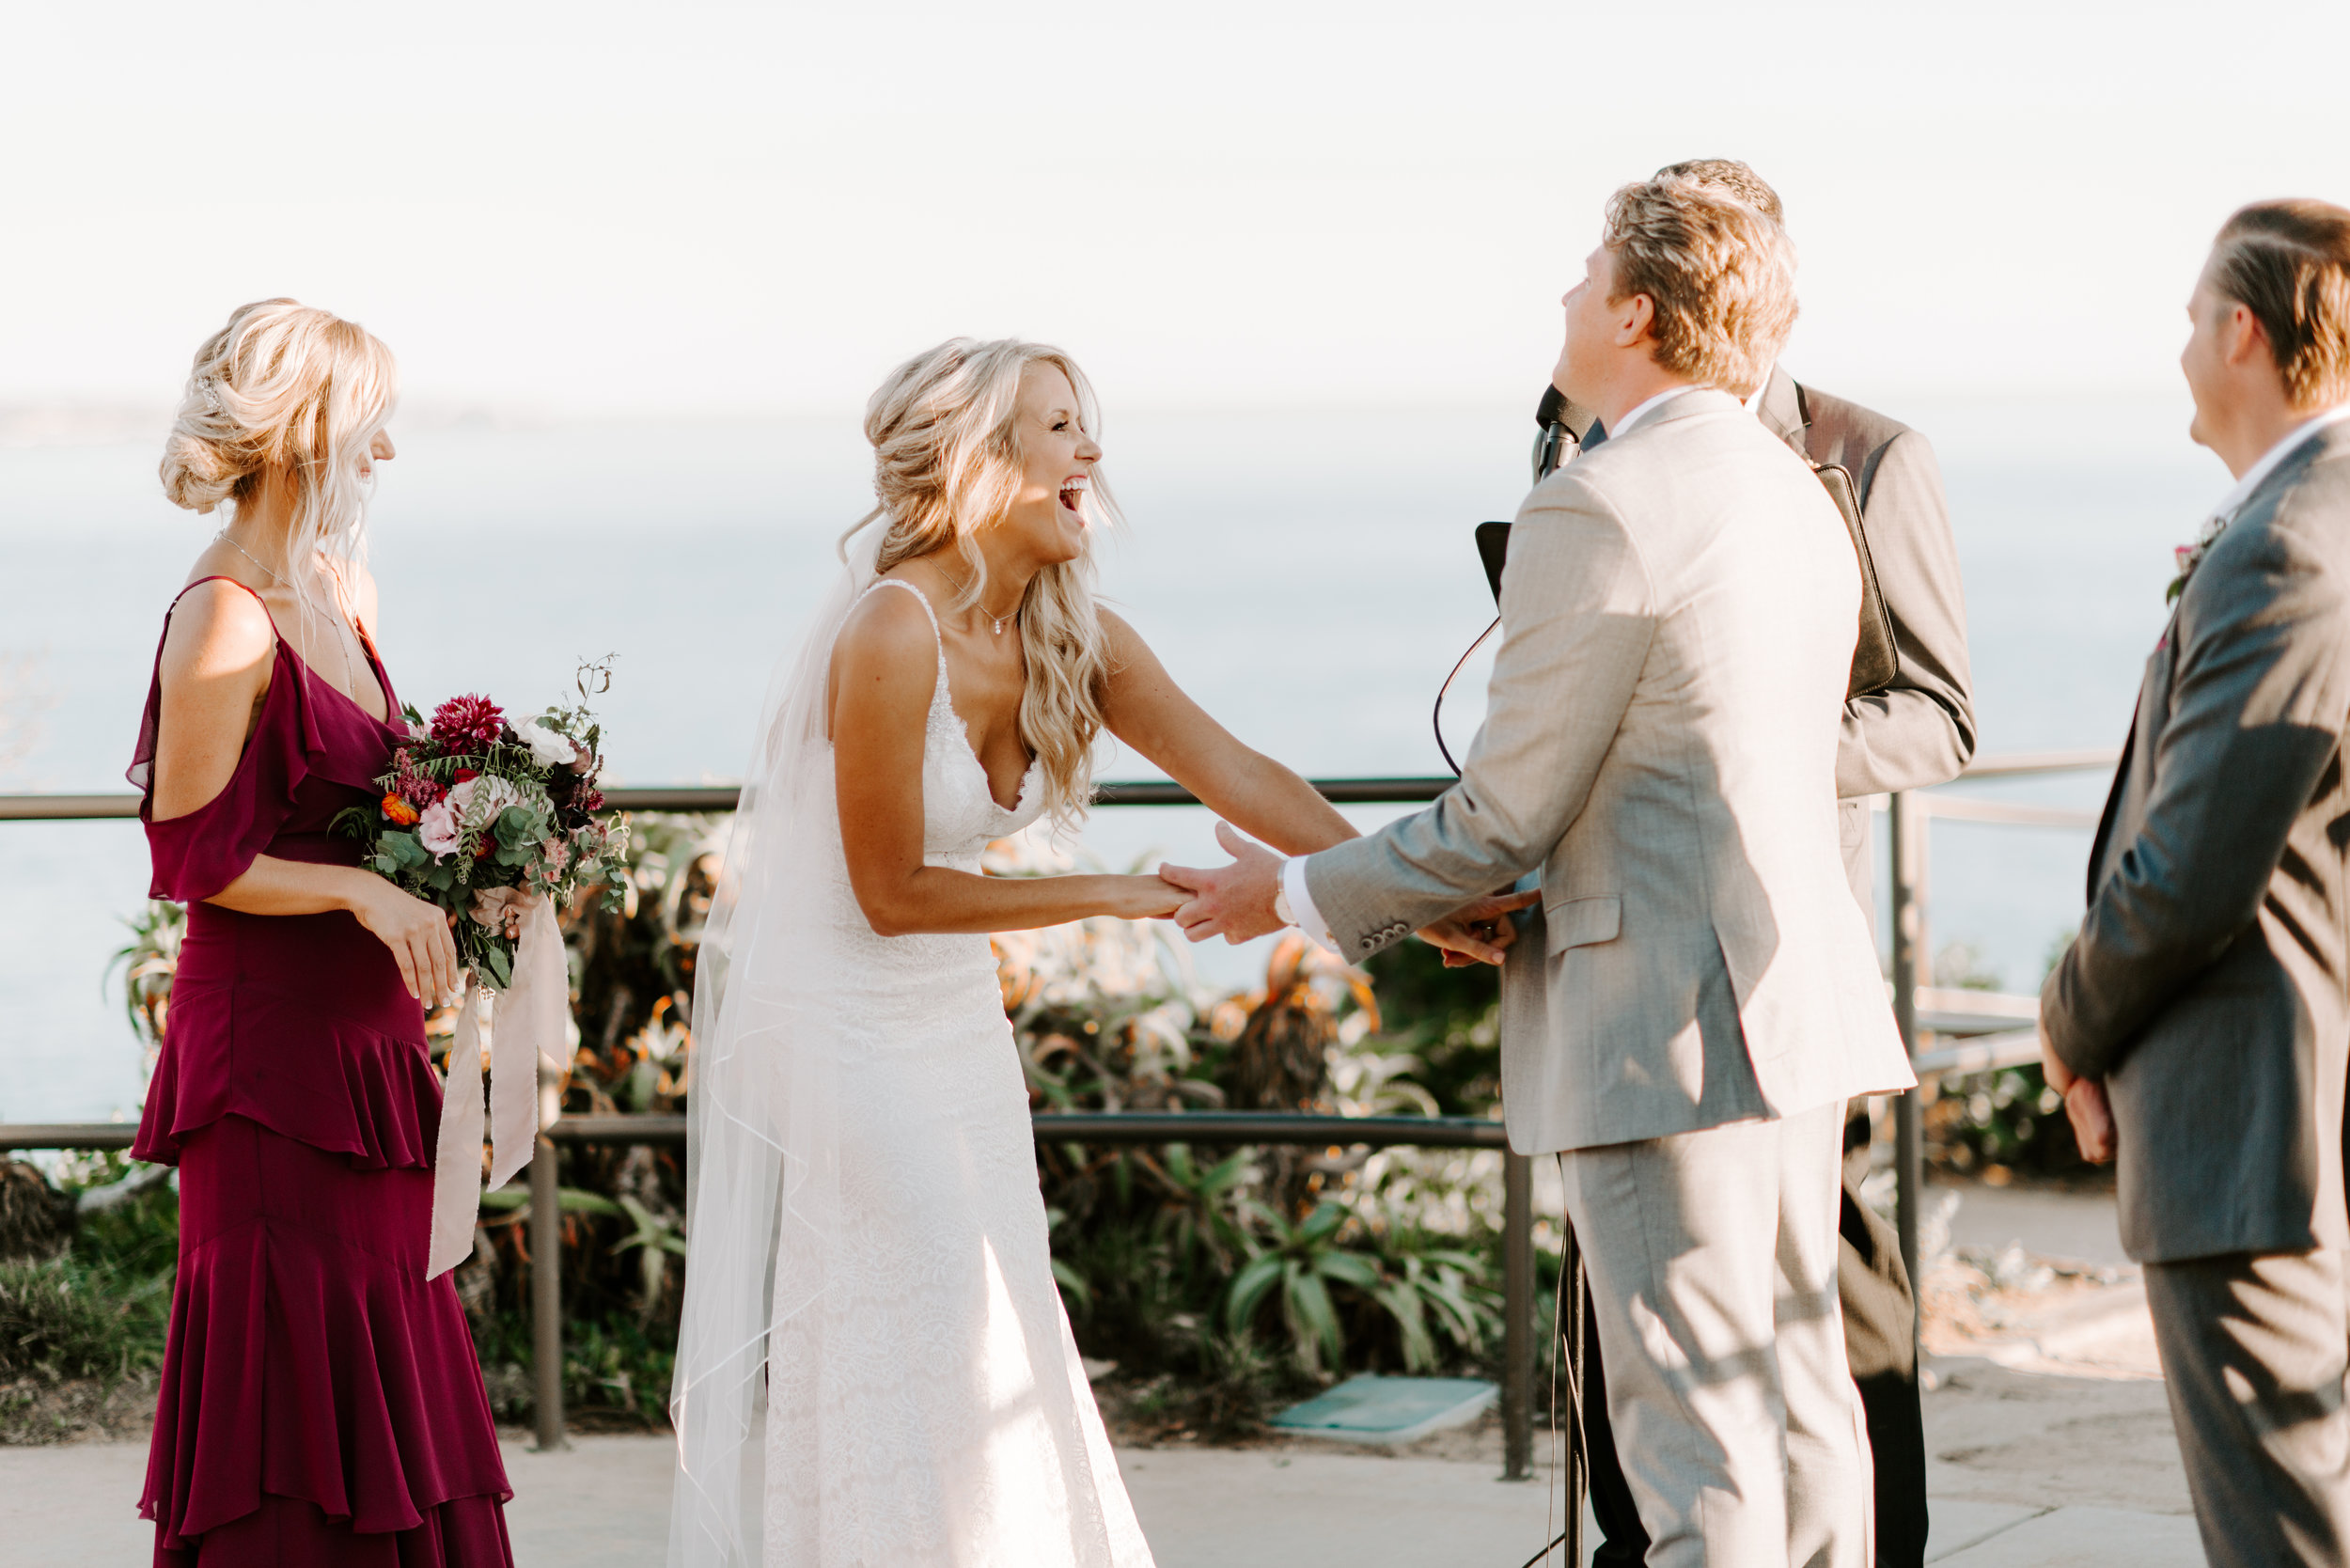 natural, effortless wedding makeup and hair